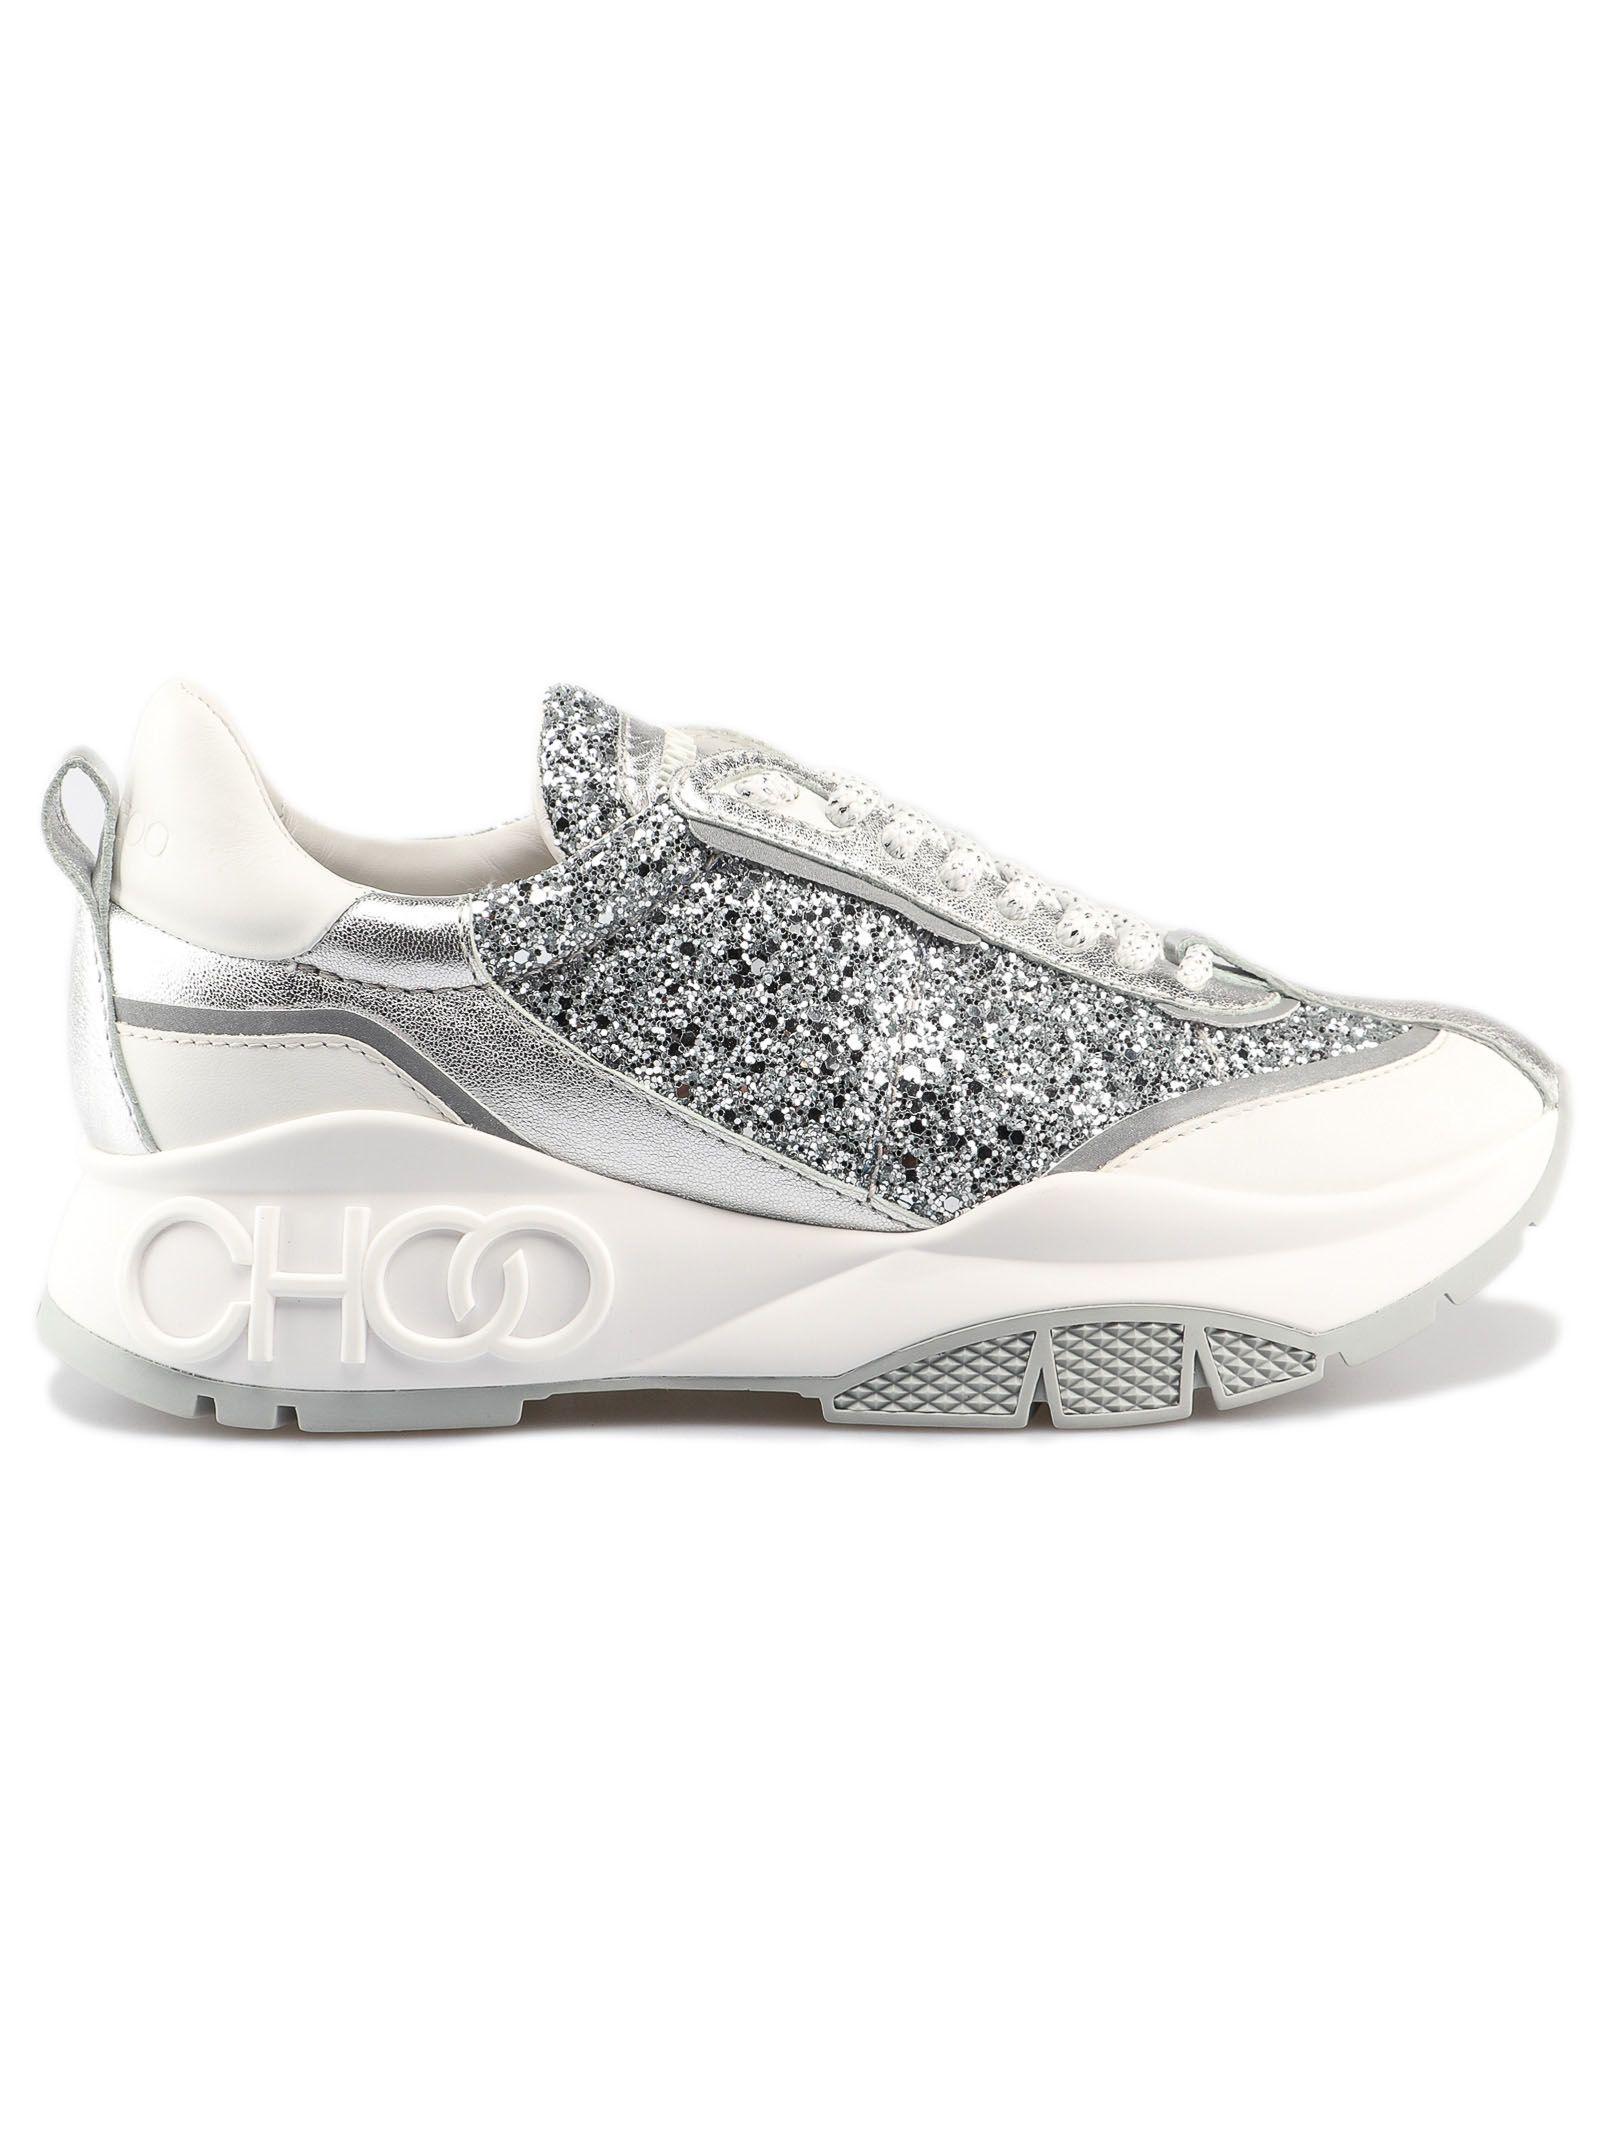 0c44ee4e0f3 Jimmy Choo Jimmy Choo Glitter Sneakers - Silver Mix - 10806129